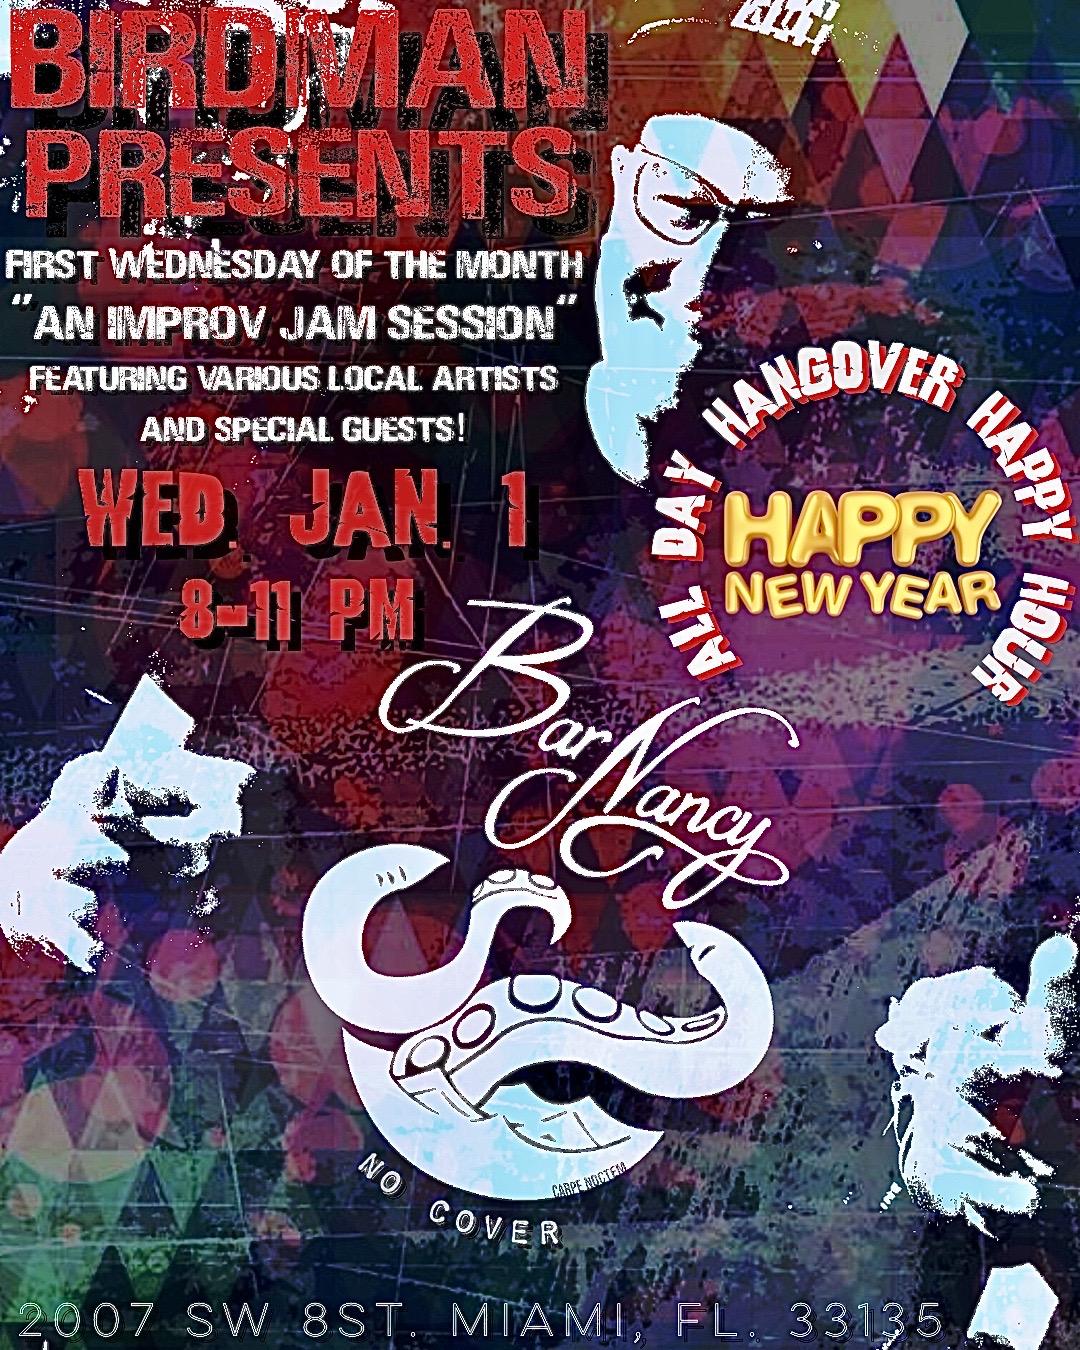 Birdman Presents New Years Day Jam! All Day Hangover Happy Hour! @ Bar Nancy